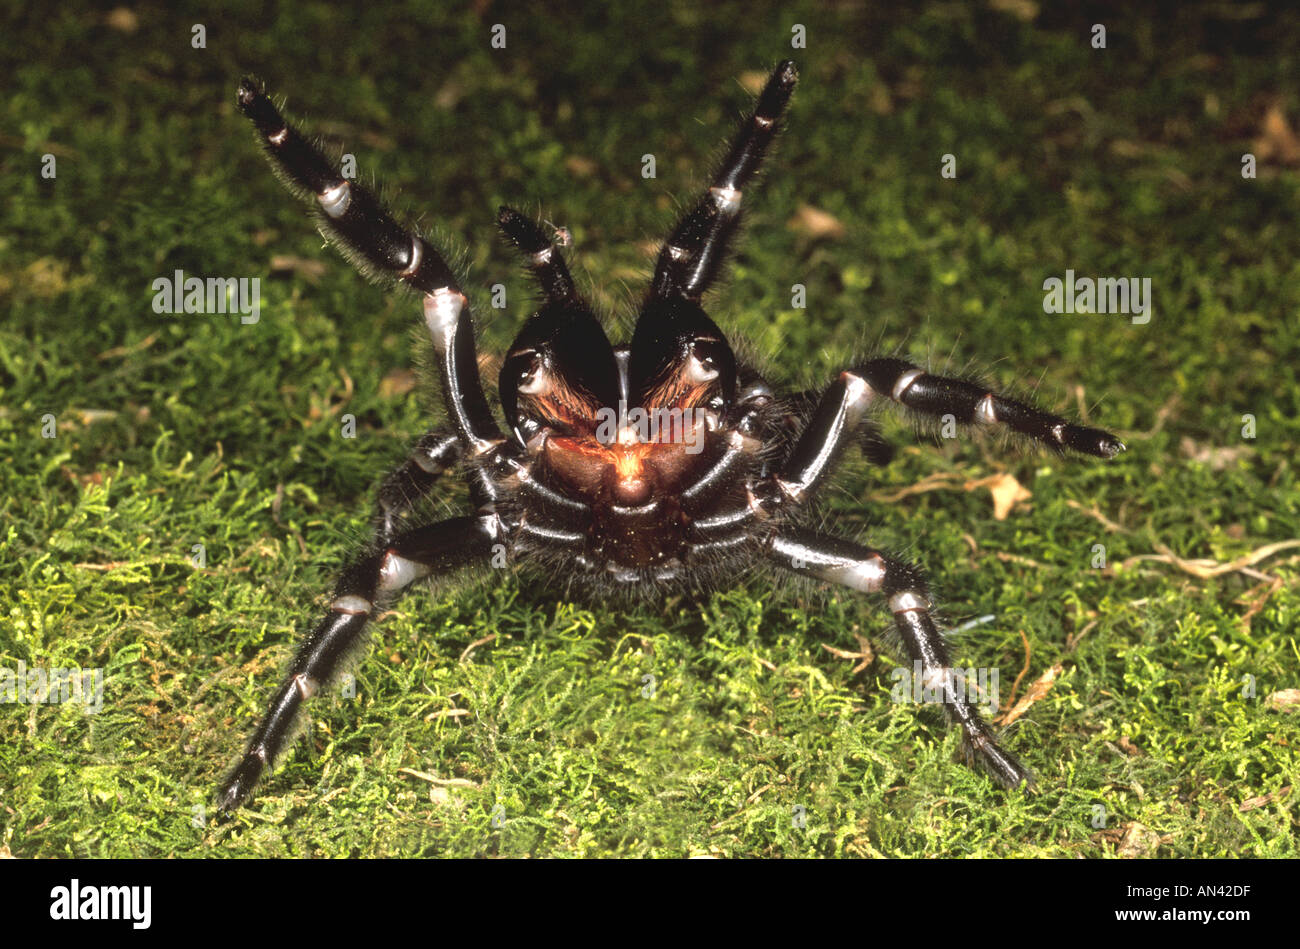 sydney-funnel-web-spider-atrax-robustus-